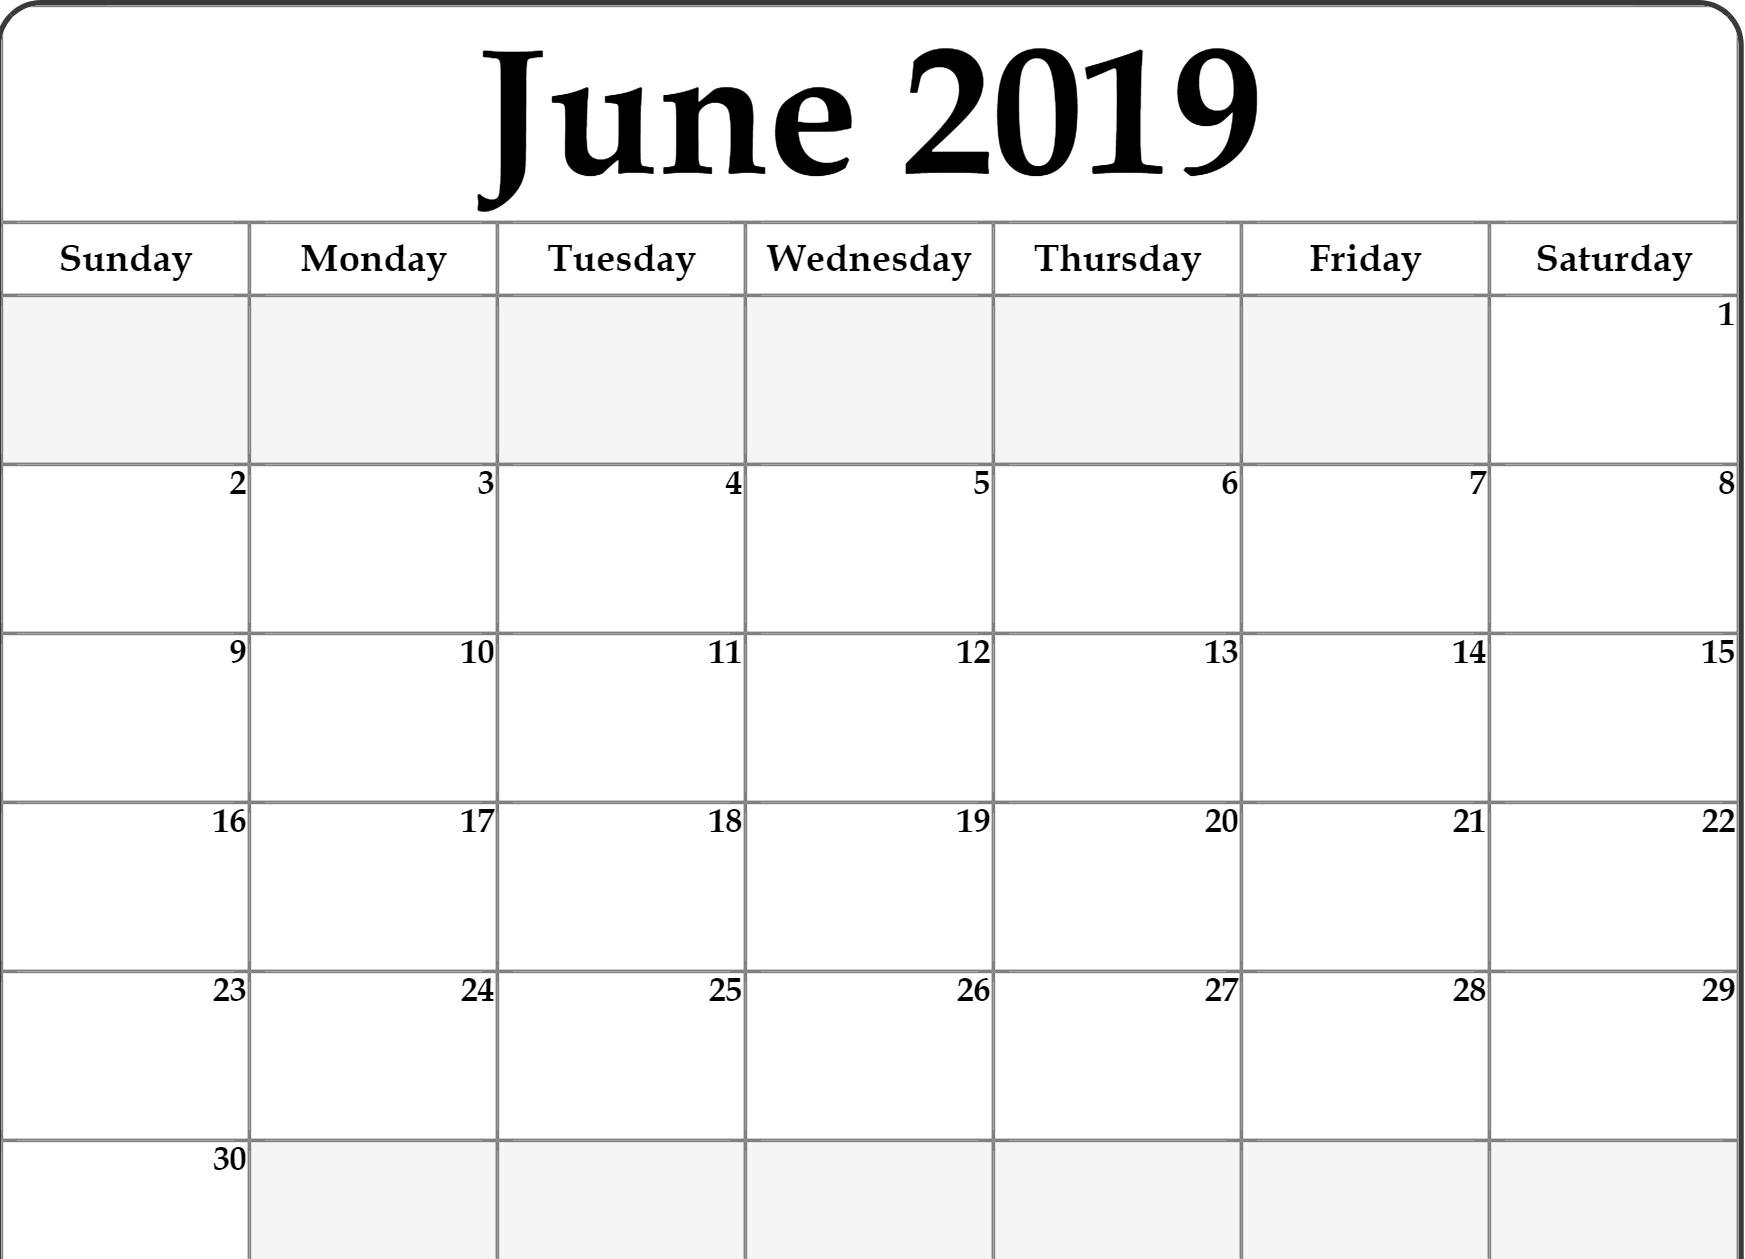 Lunar Calendar For June 2019 Printable Holidays Word June Monday To Friday Downloadable Calendar